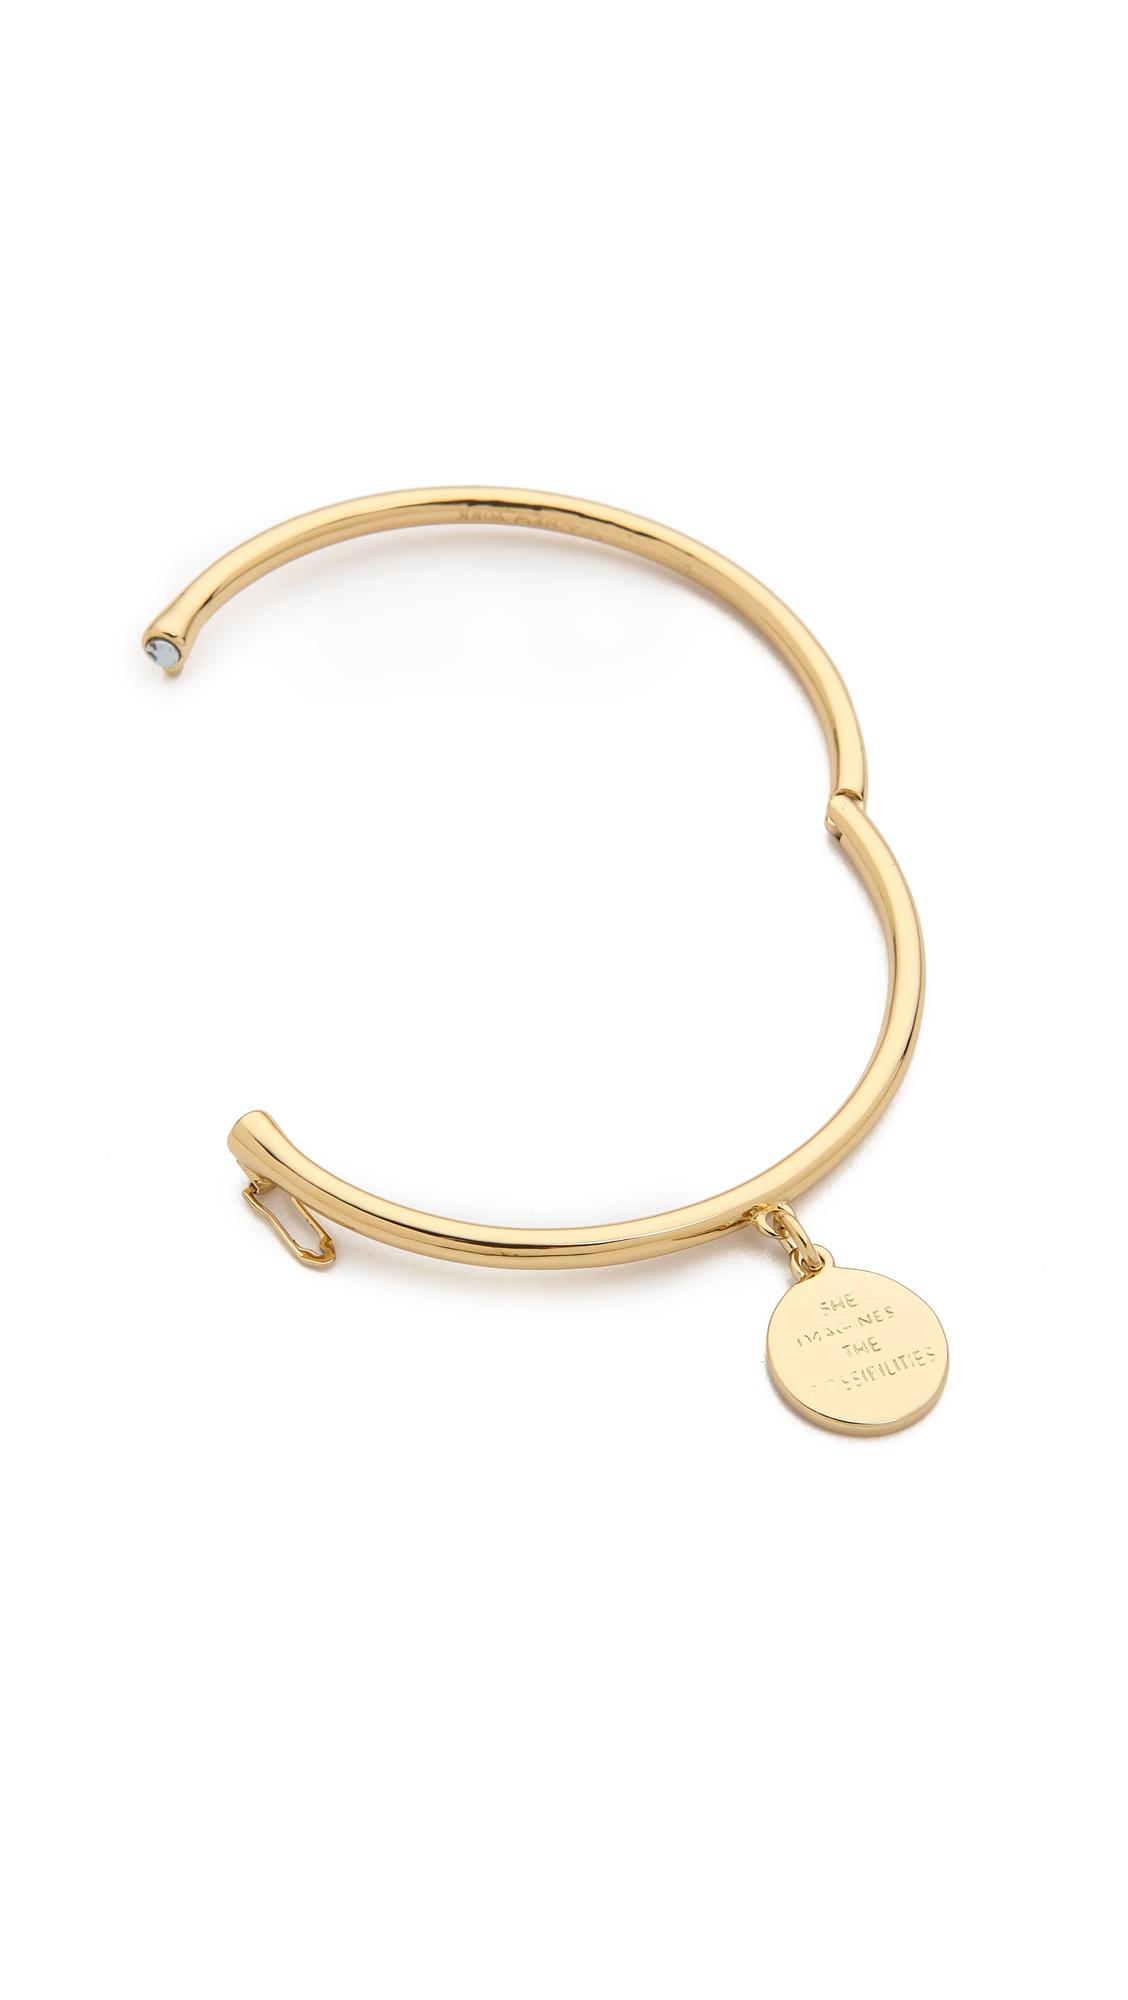 Kate Spade New York Zodiac Charm Bangle Bracelet